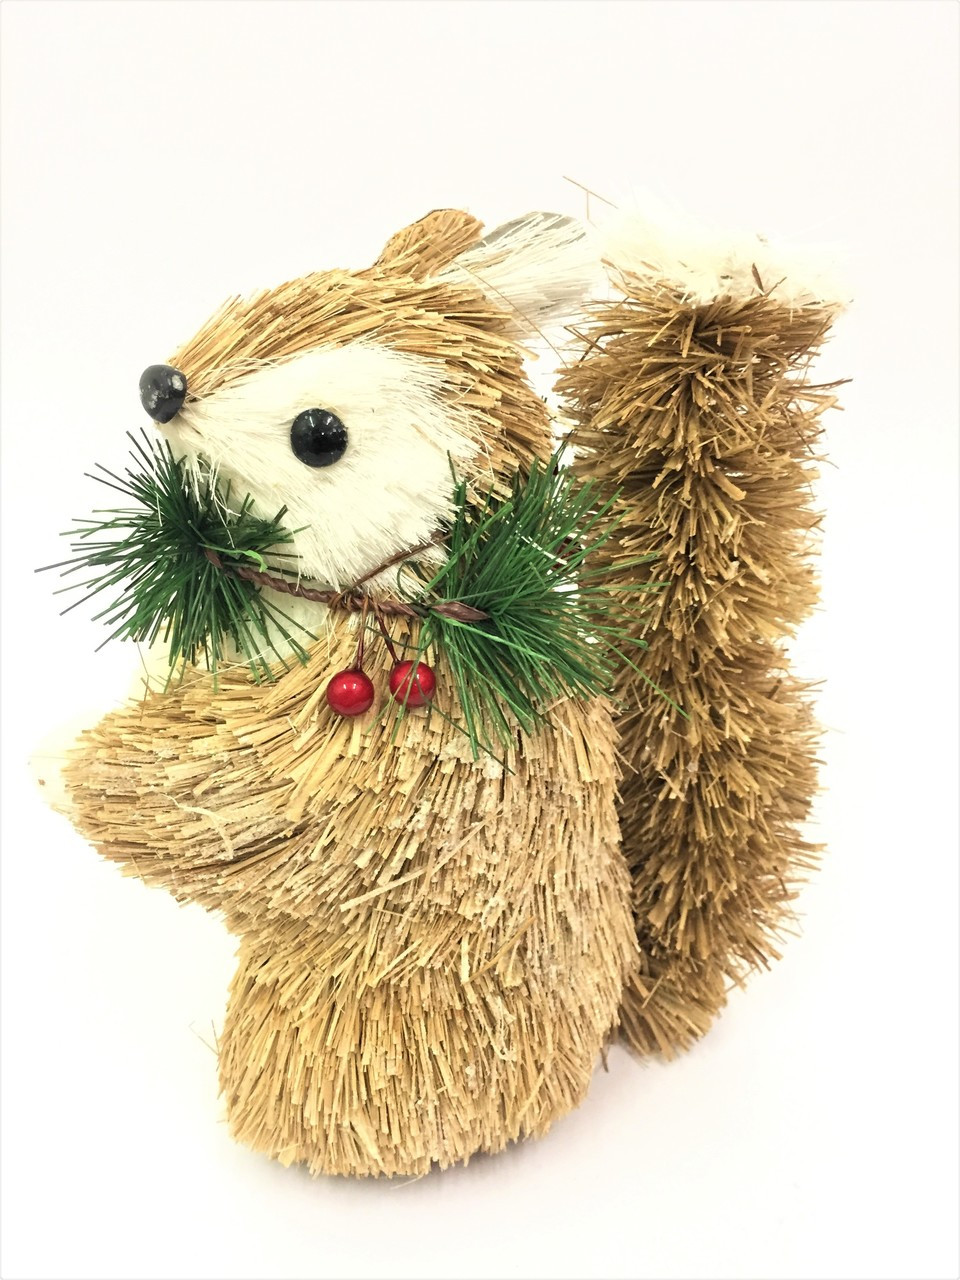 BBS-CHRISTMAS SQUIRREL WITH WREATH - 22CM BRISTLESTRAW Christmas Decoration